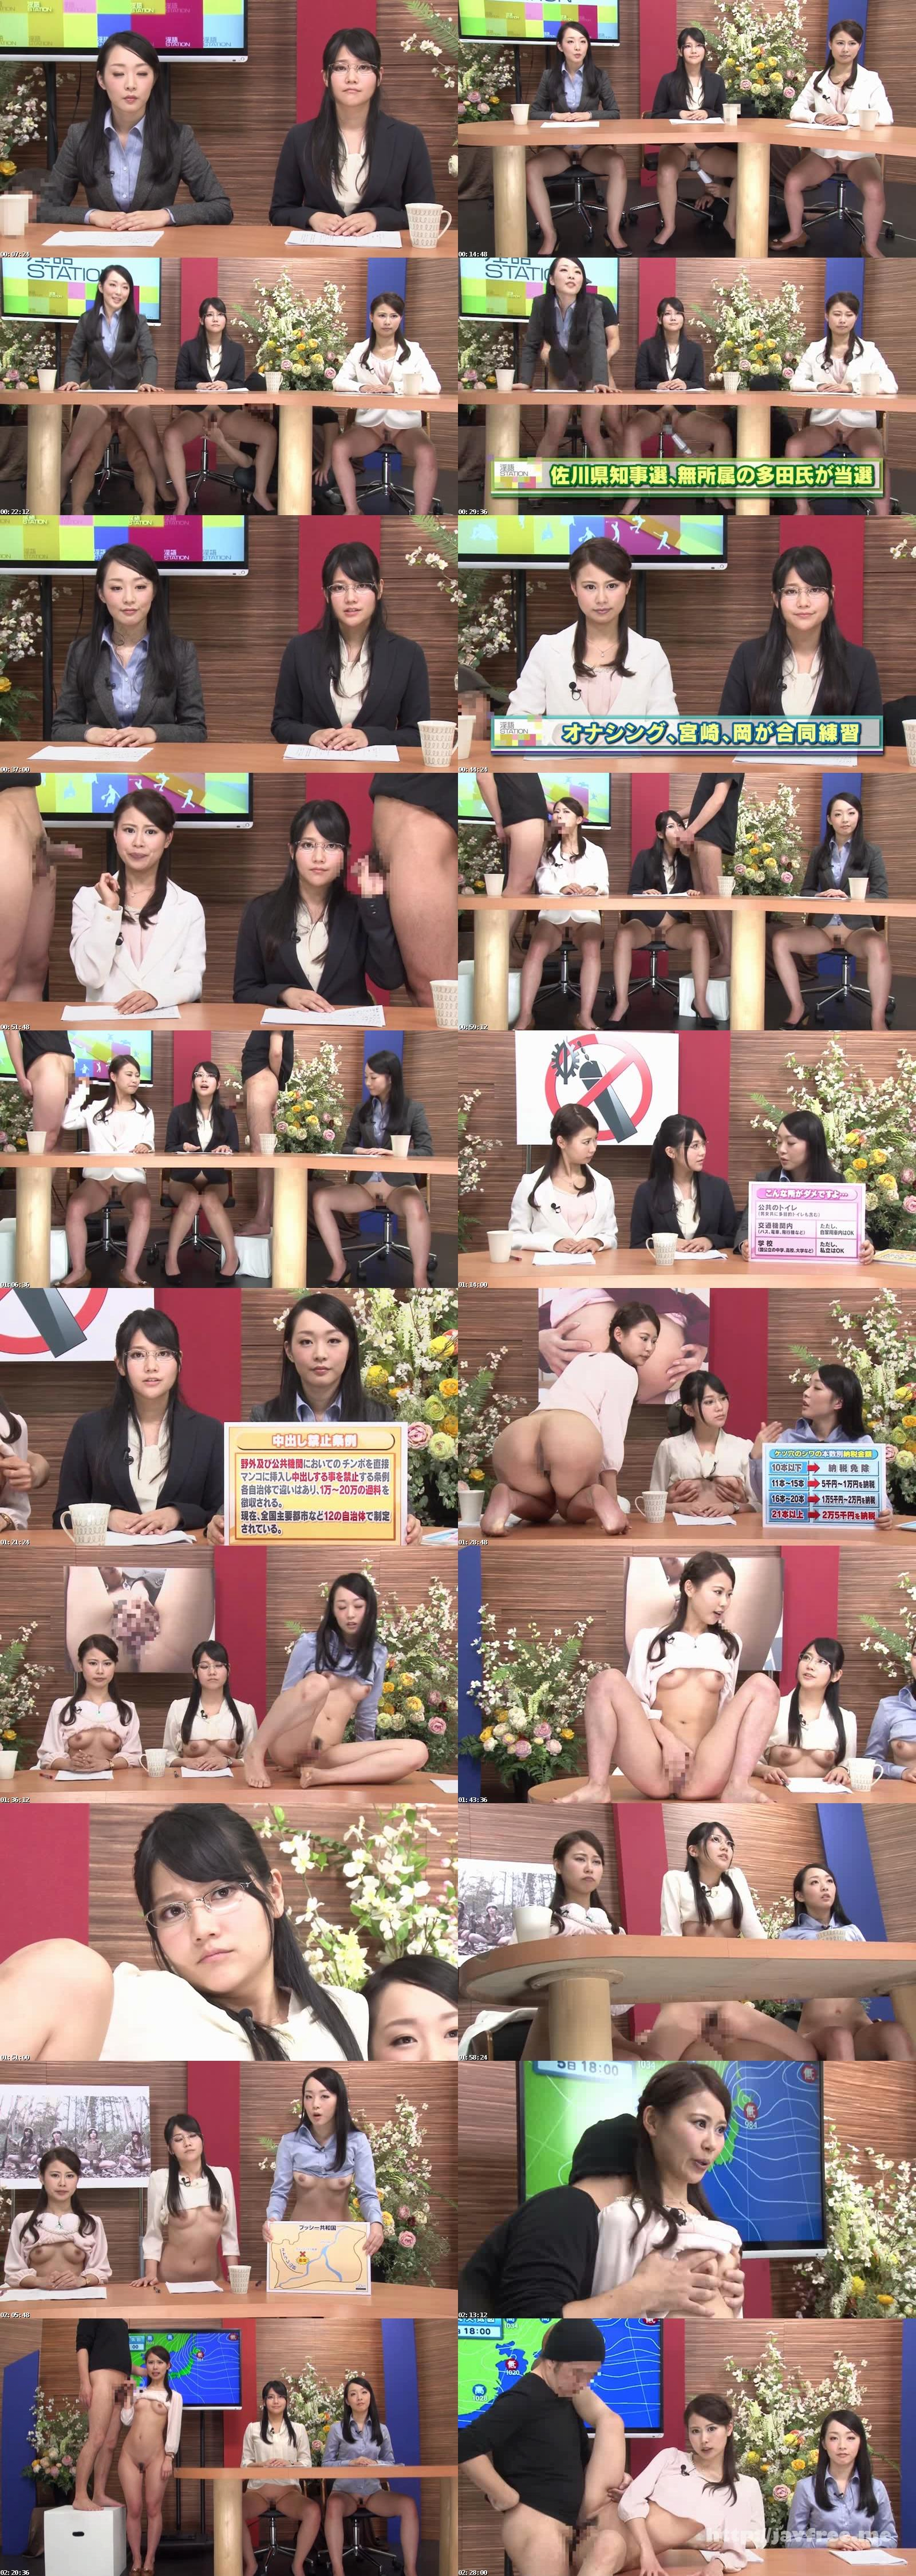 [RCT-710] 淫語女子アナ 6 下半身丸出し淫語STATION - image RCT-710 on https://javfree.me